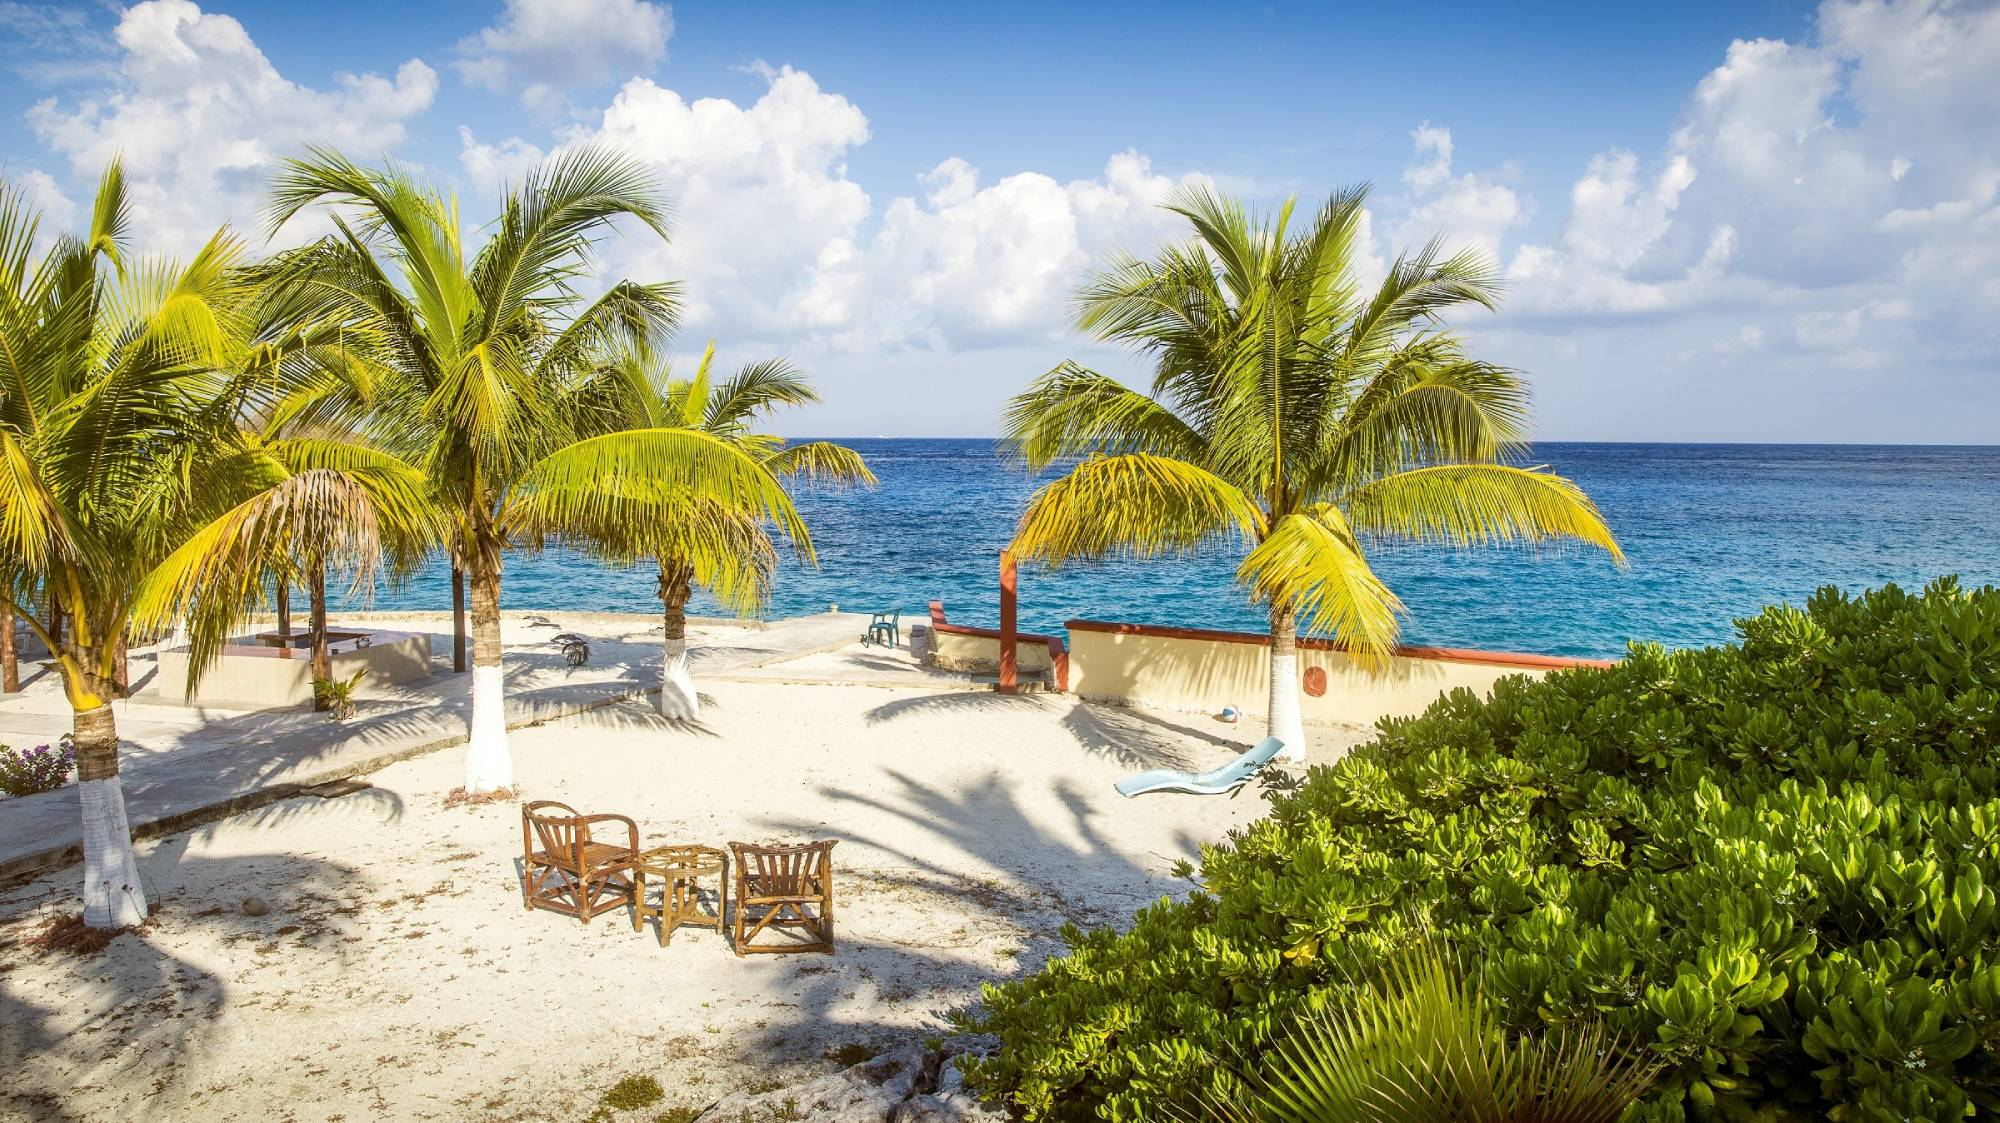 Cozumel - Travel Blog